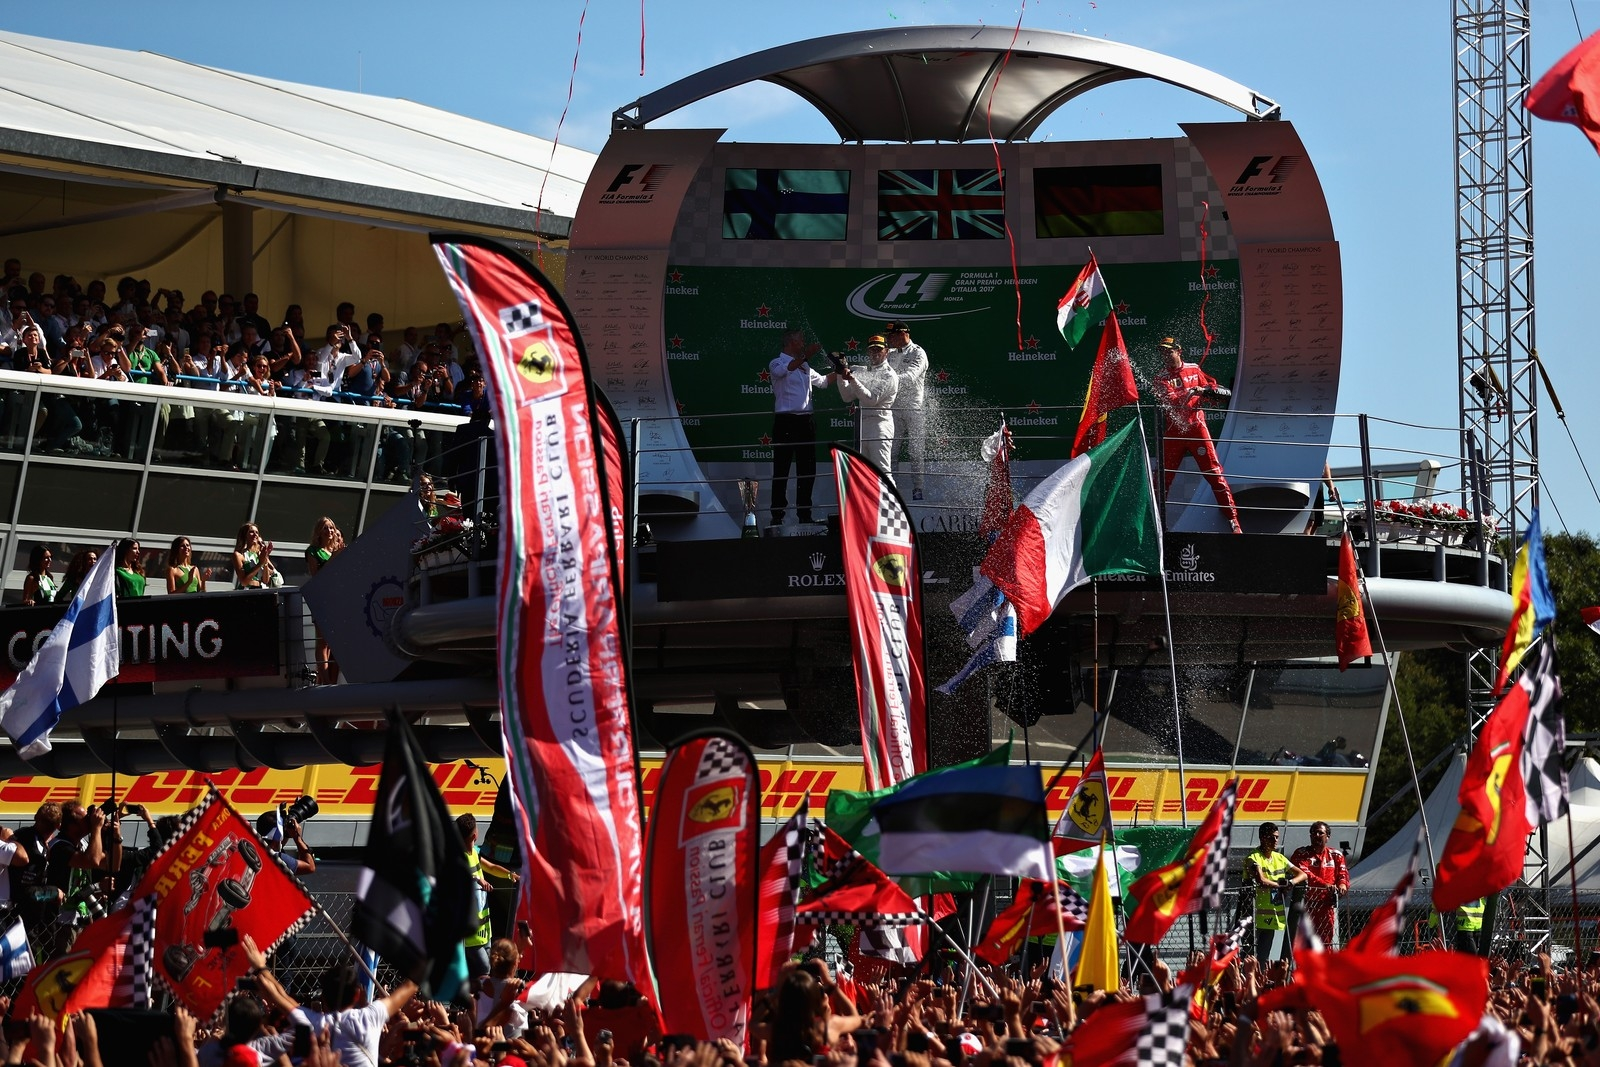 Hamilton P1, Bottas P2 e Vettel P3: a festa do pódio em Monza